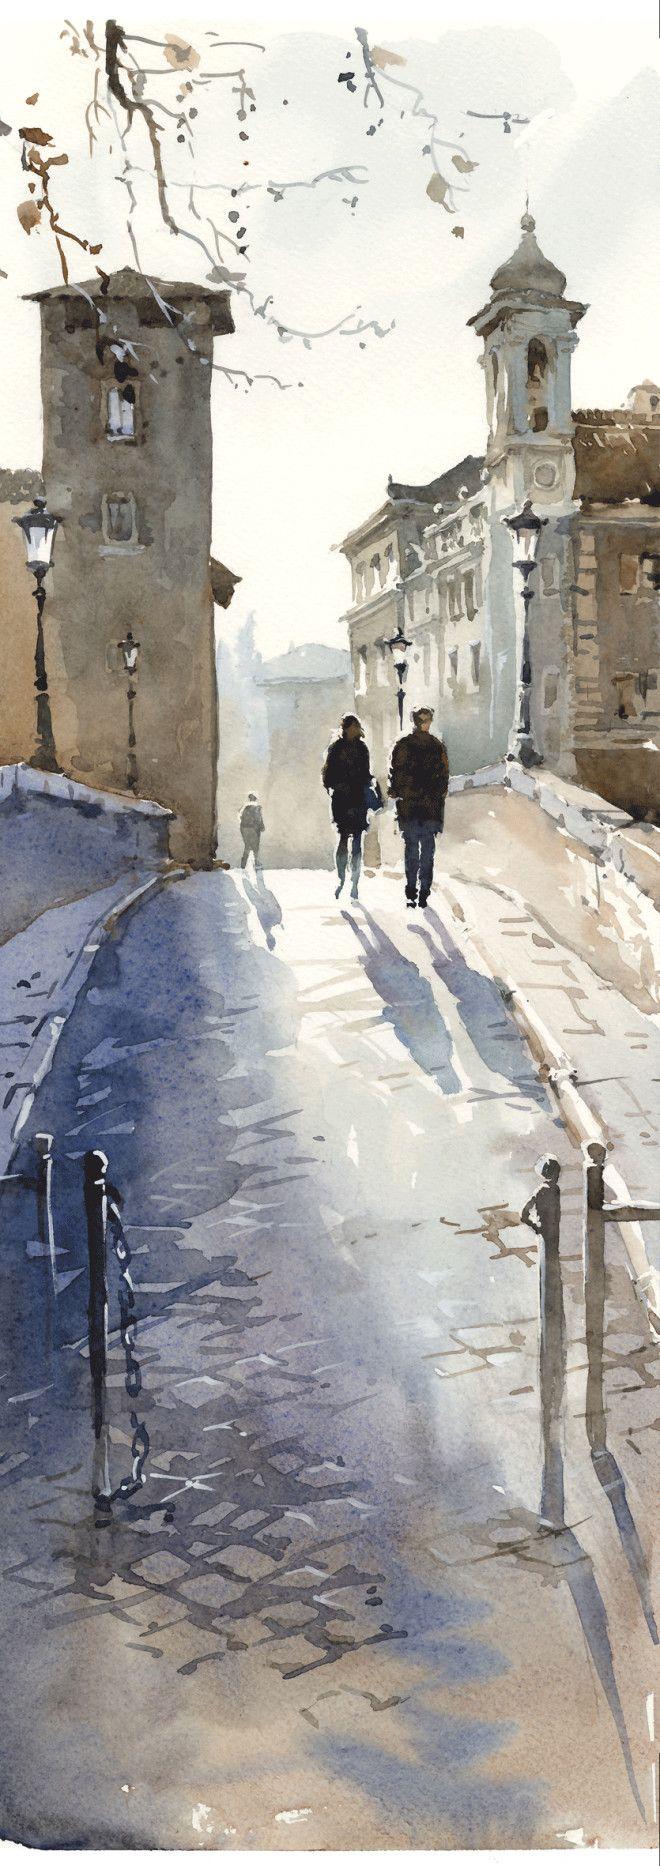 Fabricio | Igor Sava